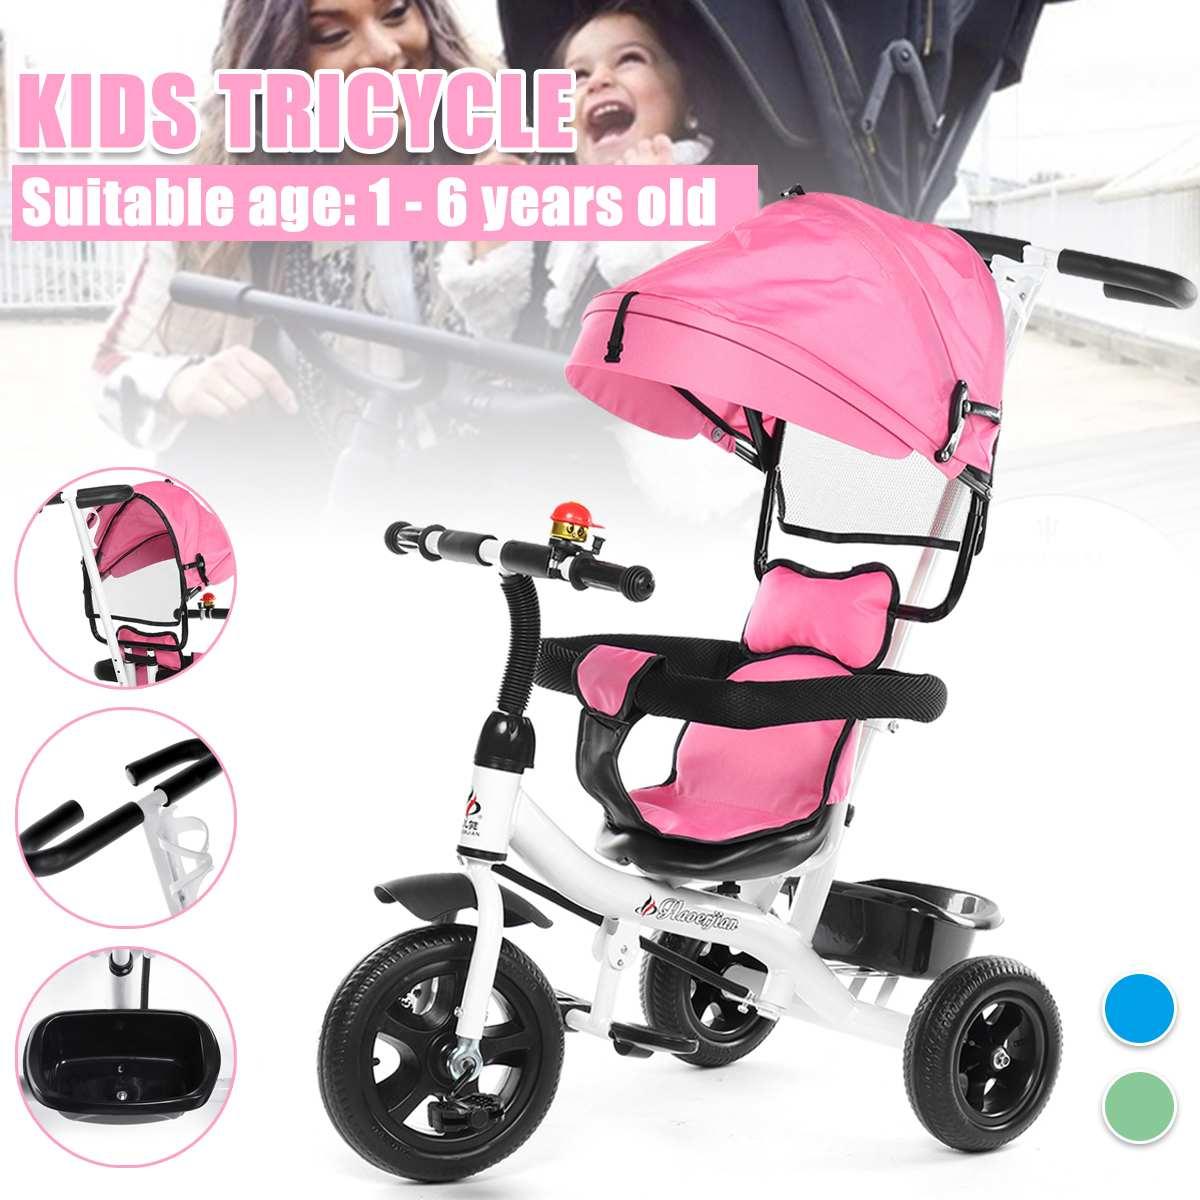 Light Baby Stroller Car Portable Folding Baby Stroller Lightweight Pram Baby Carriage Children Tricycle Bike 3 Wheel Bicycle